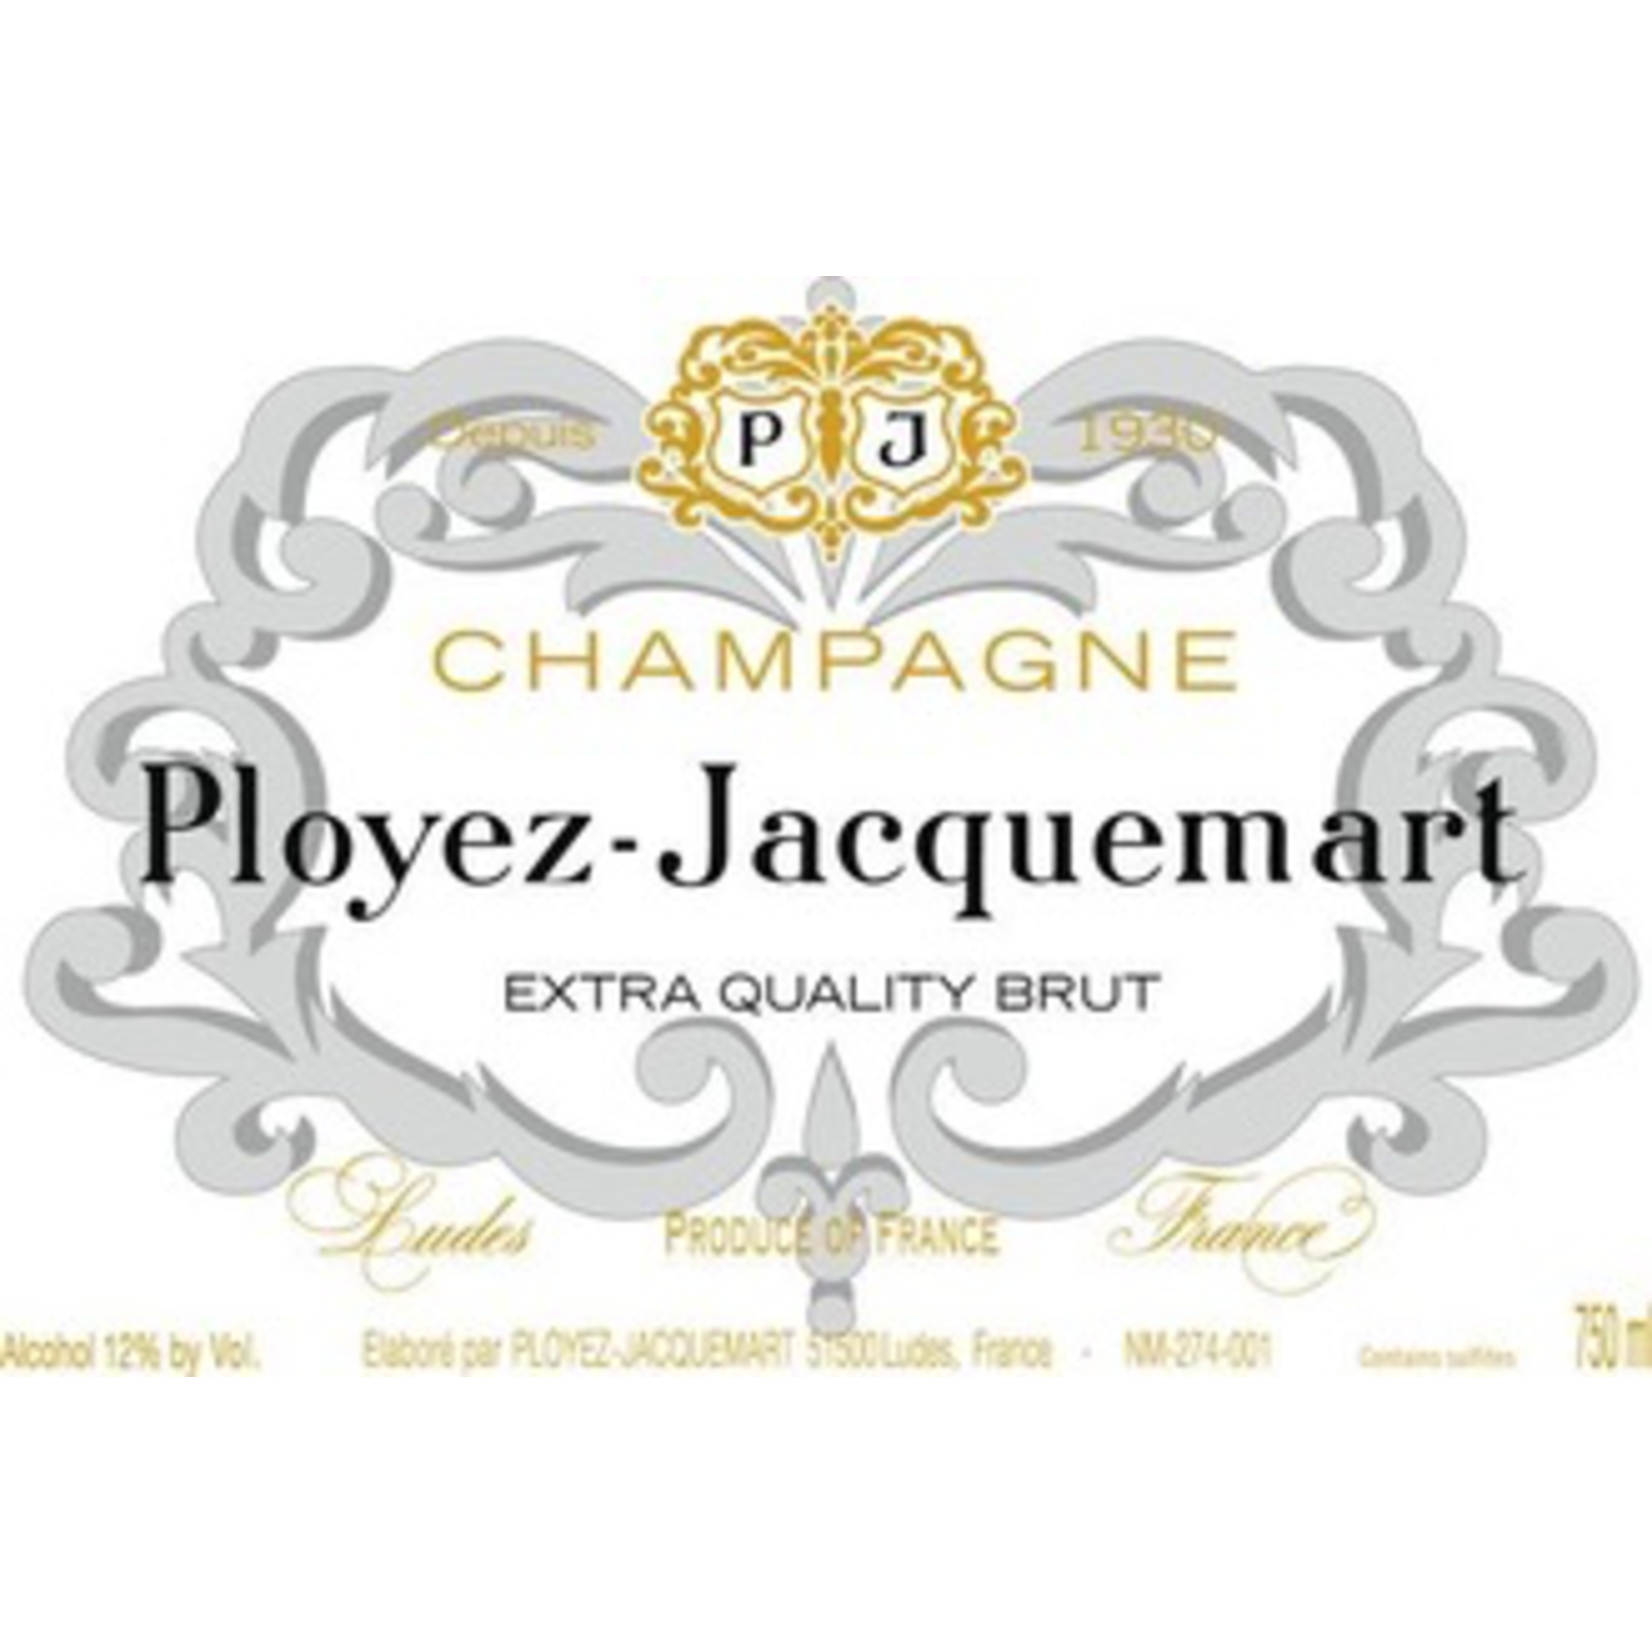 Sparkling Champagne Ployez Jacquemart Champagne Extra Quality Brut 375ml